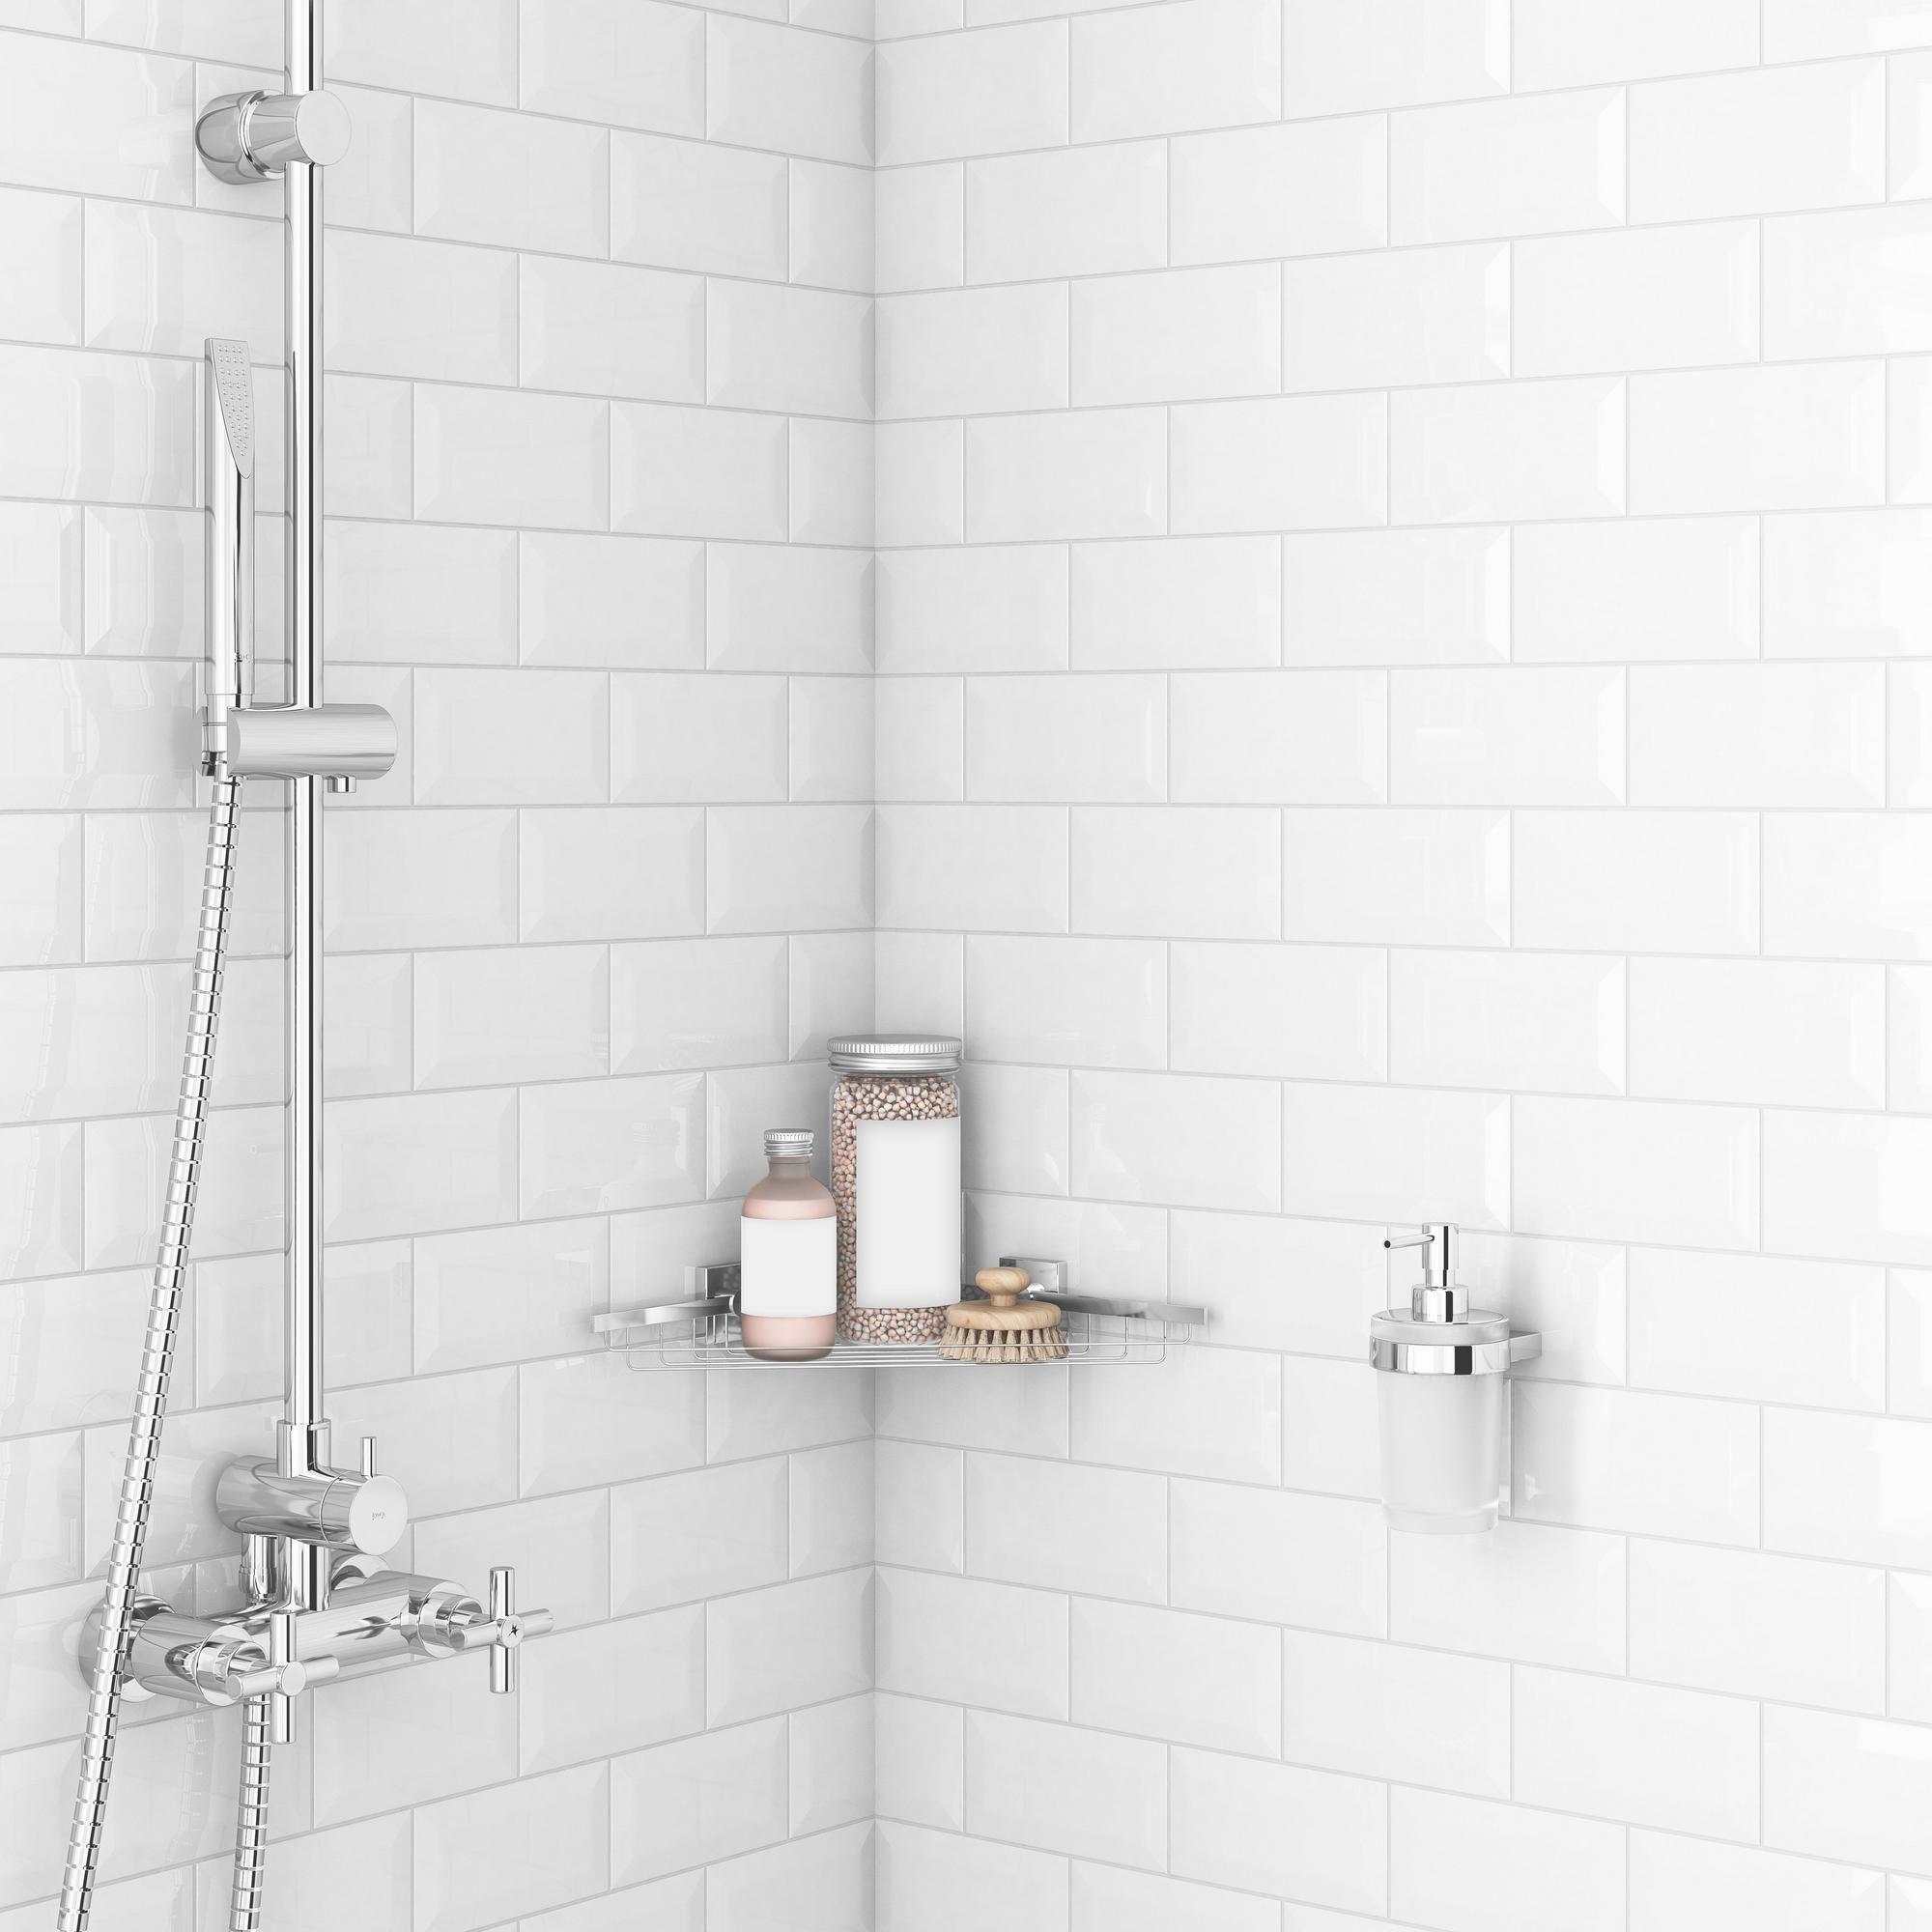 Bright White Ice Beveled Ceramic Wall Tile Floor Decor Ceramic Wall Tiles Mold In Bathroom Bathroom Wall Tile